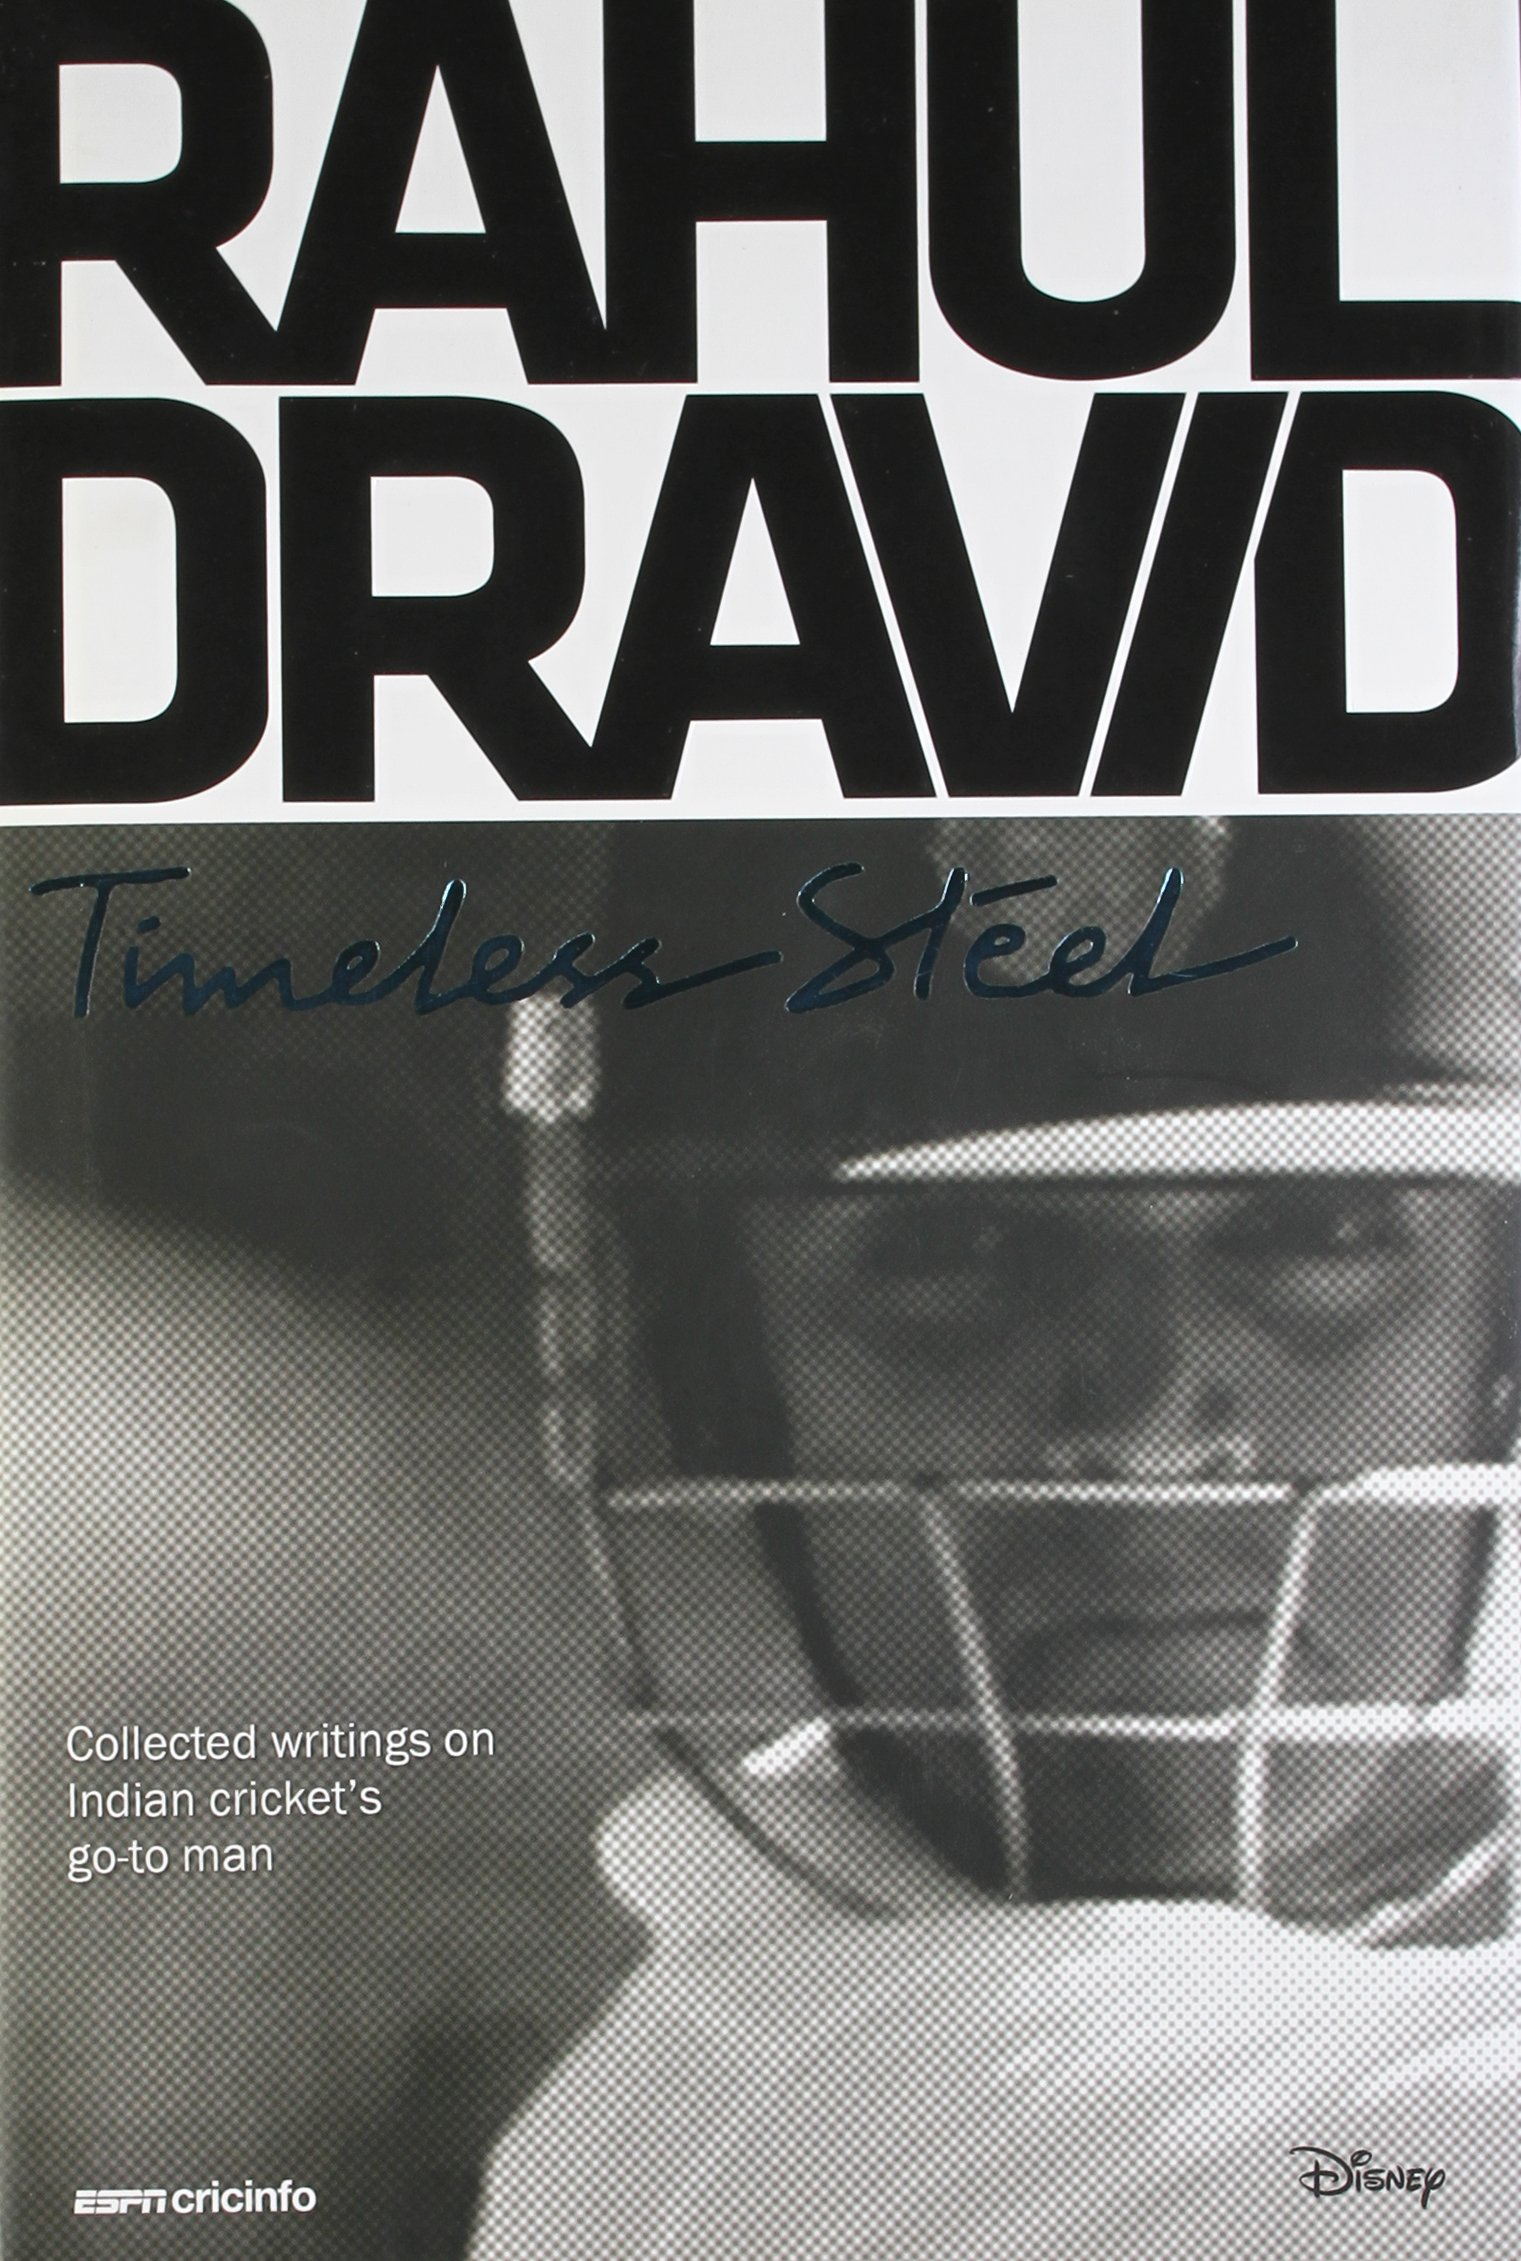 steel timeless rahul pdf dravid book